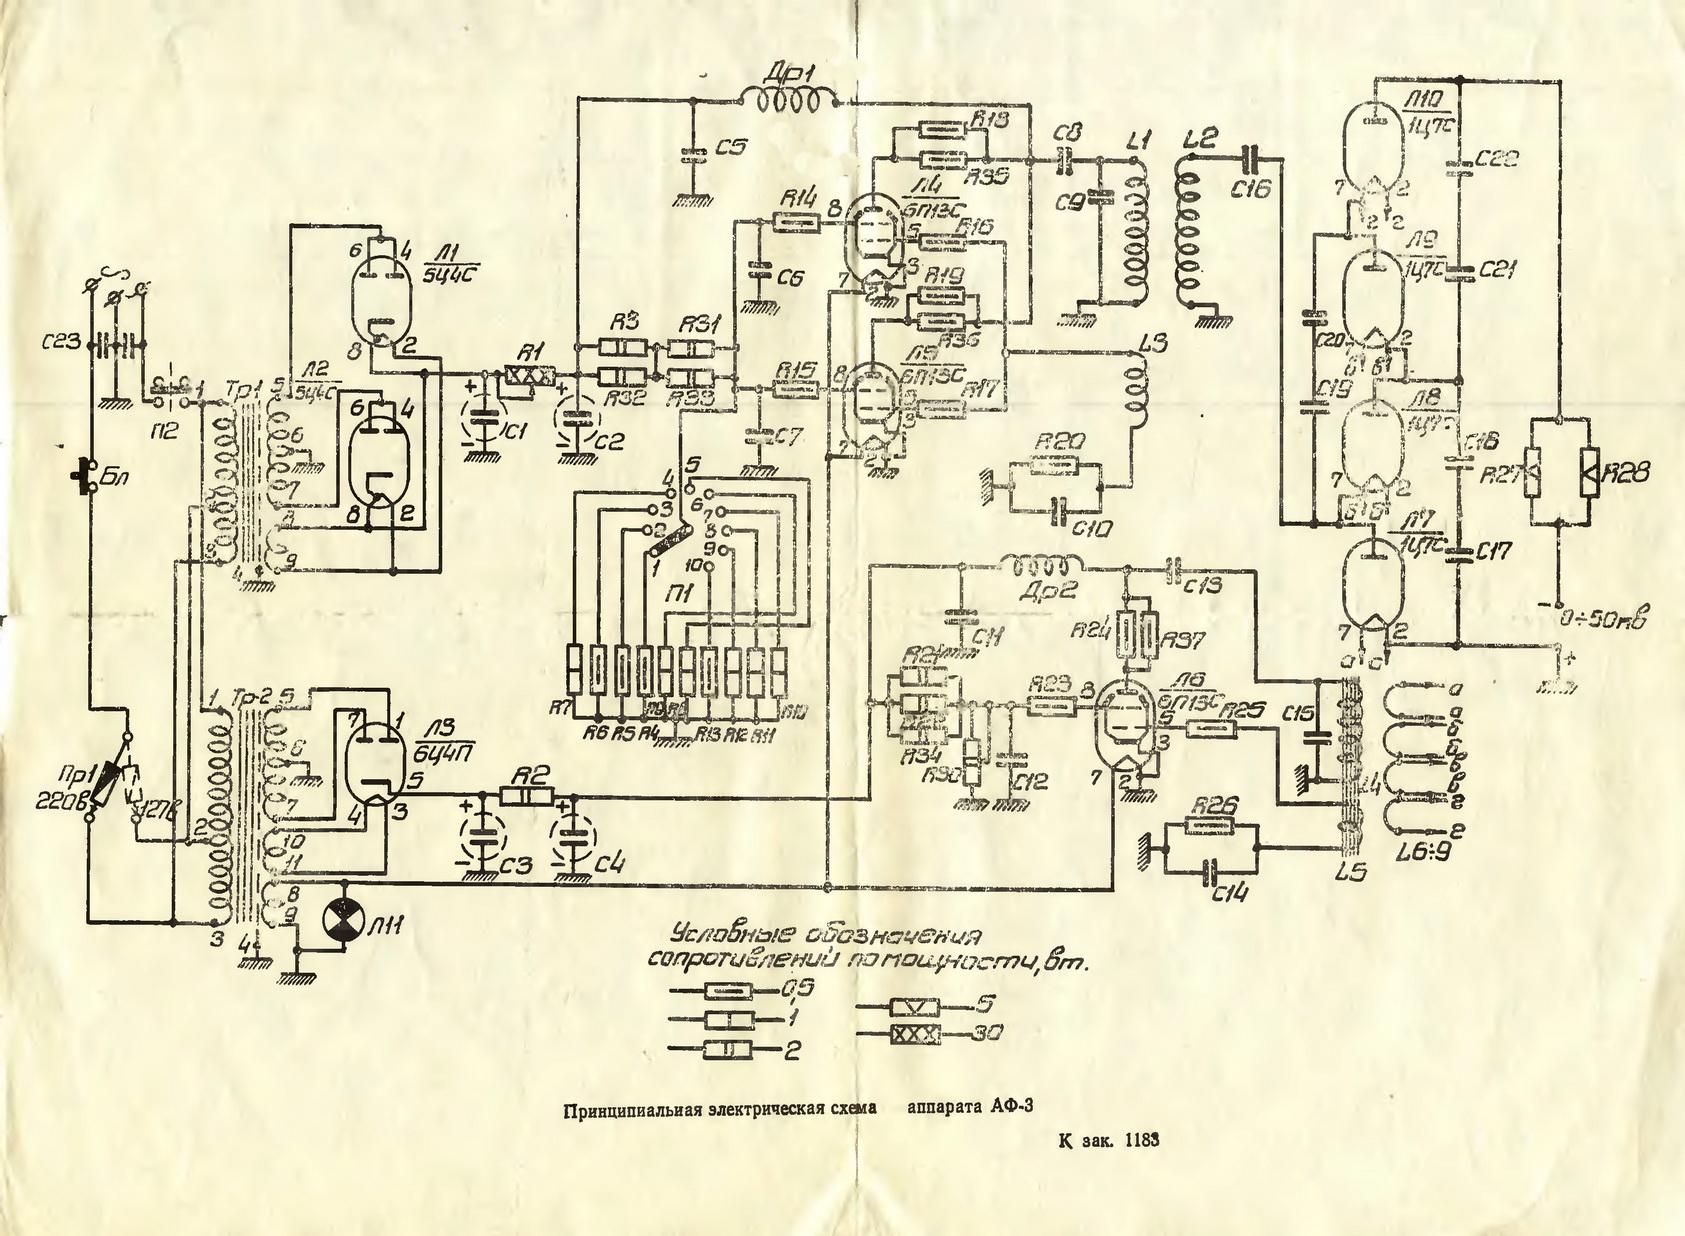 схема на прибор маг магнитотерапия